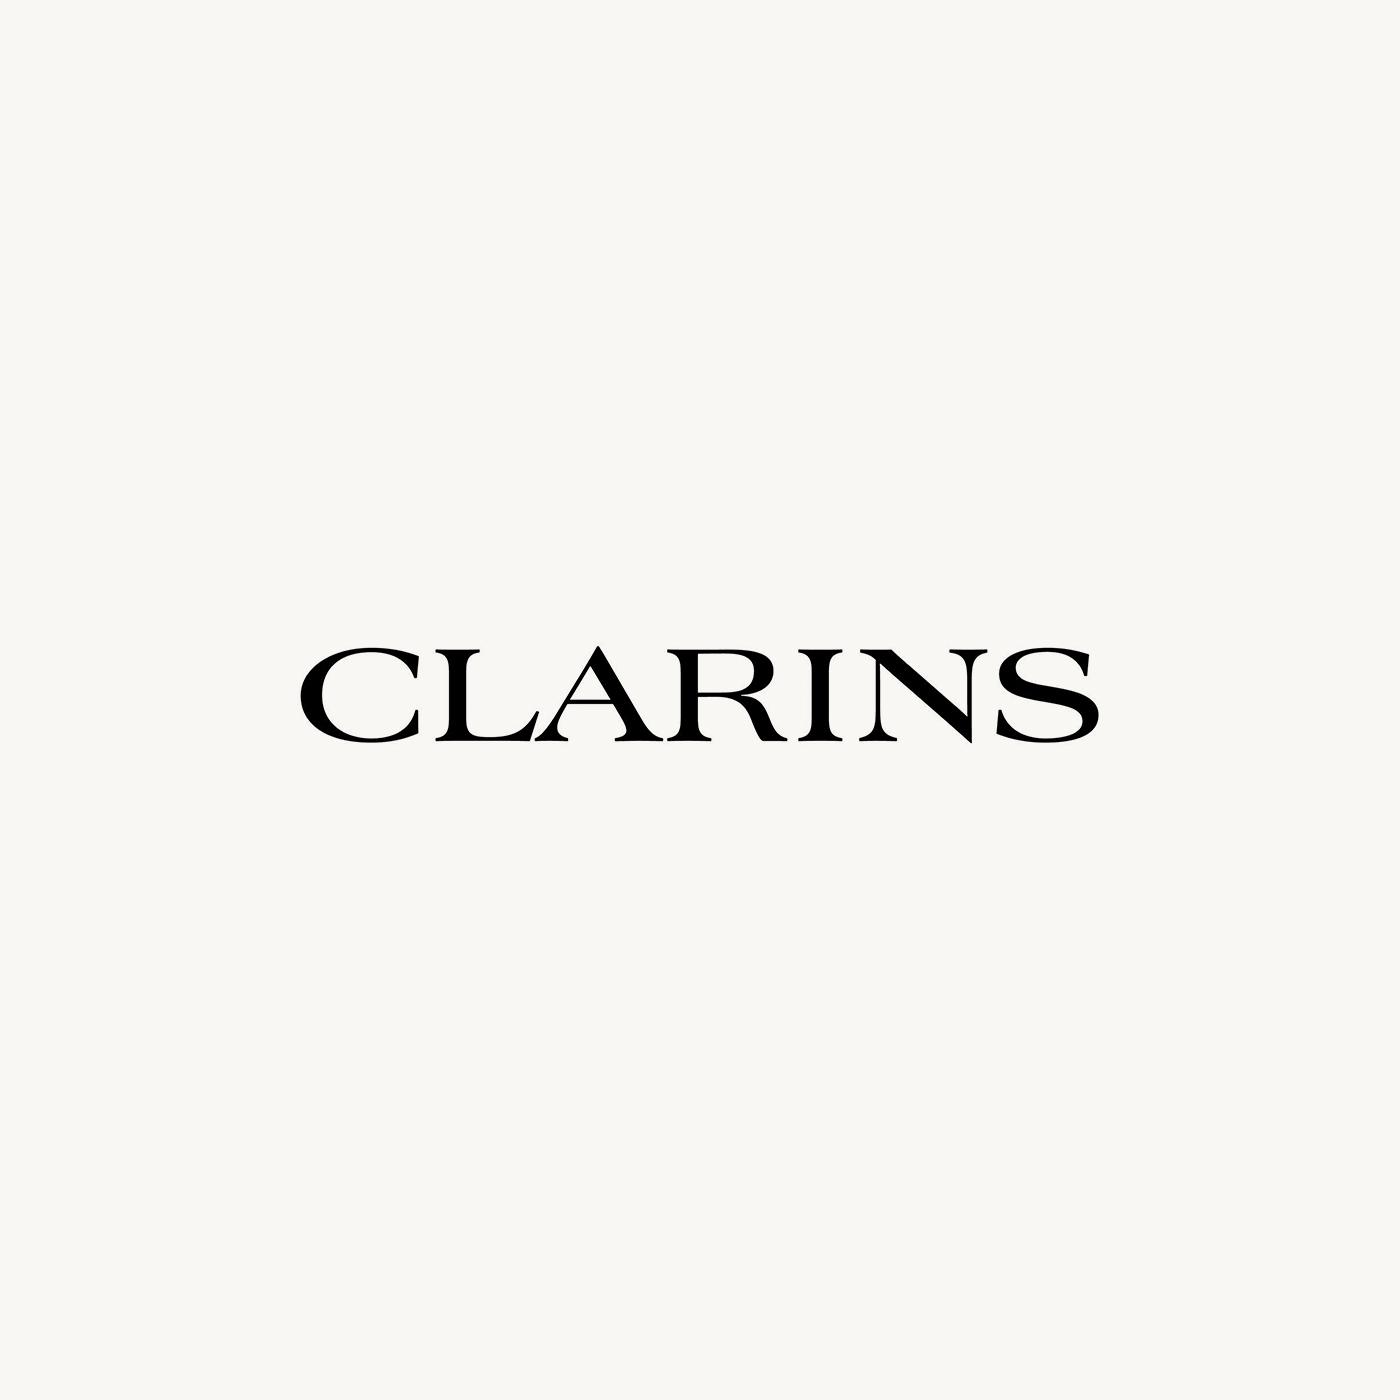 Clarins Logo.jpg